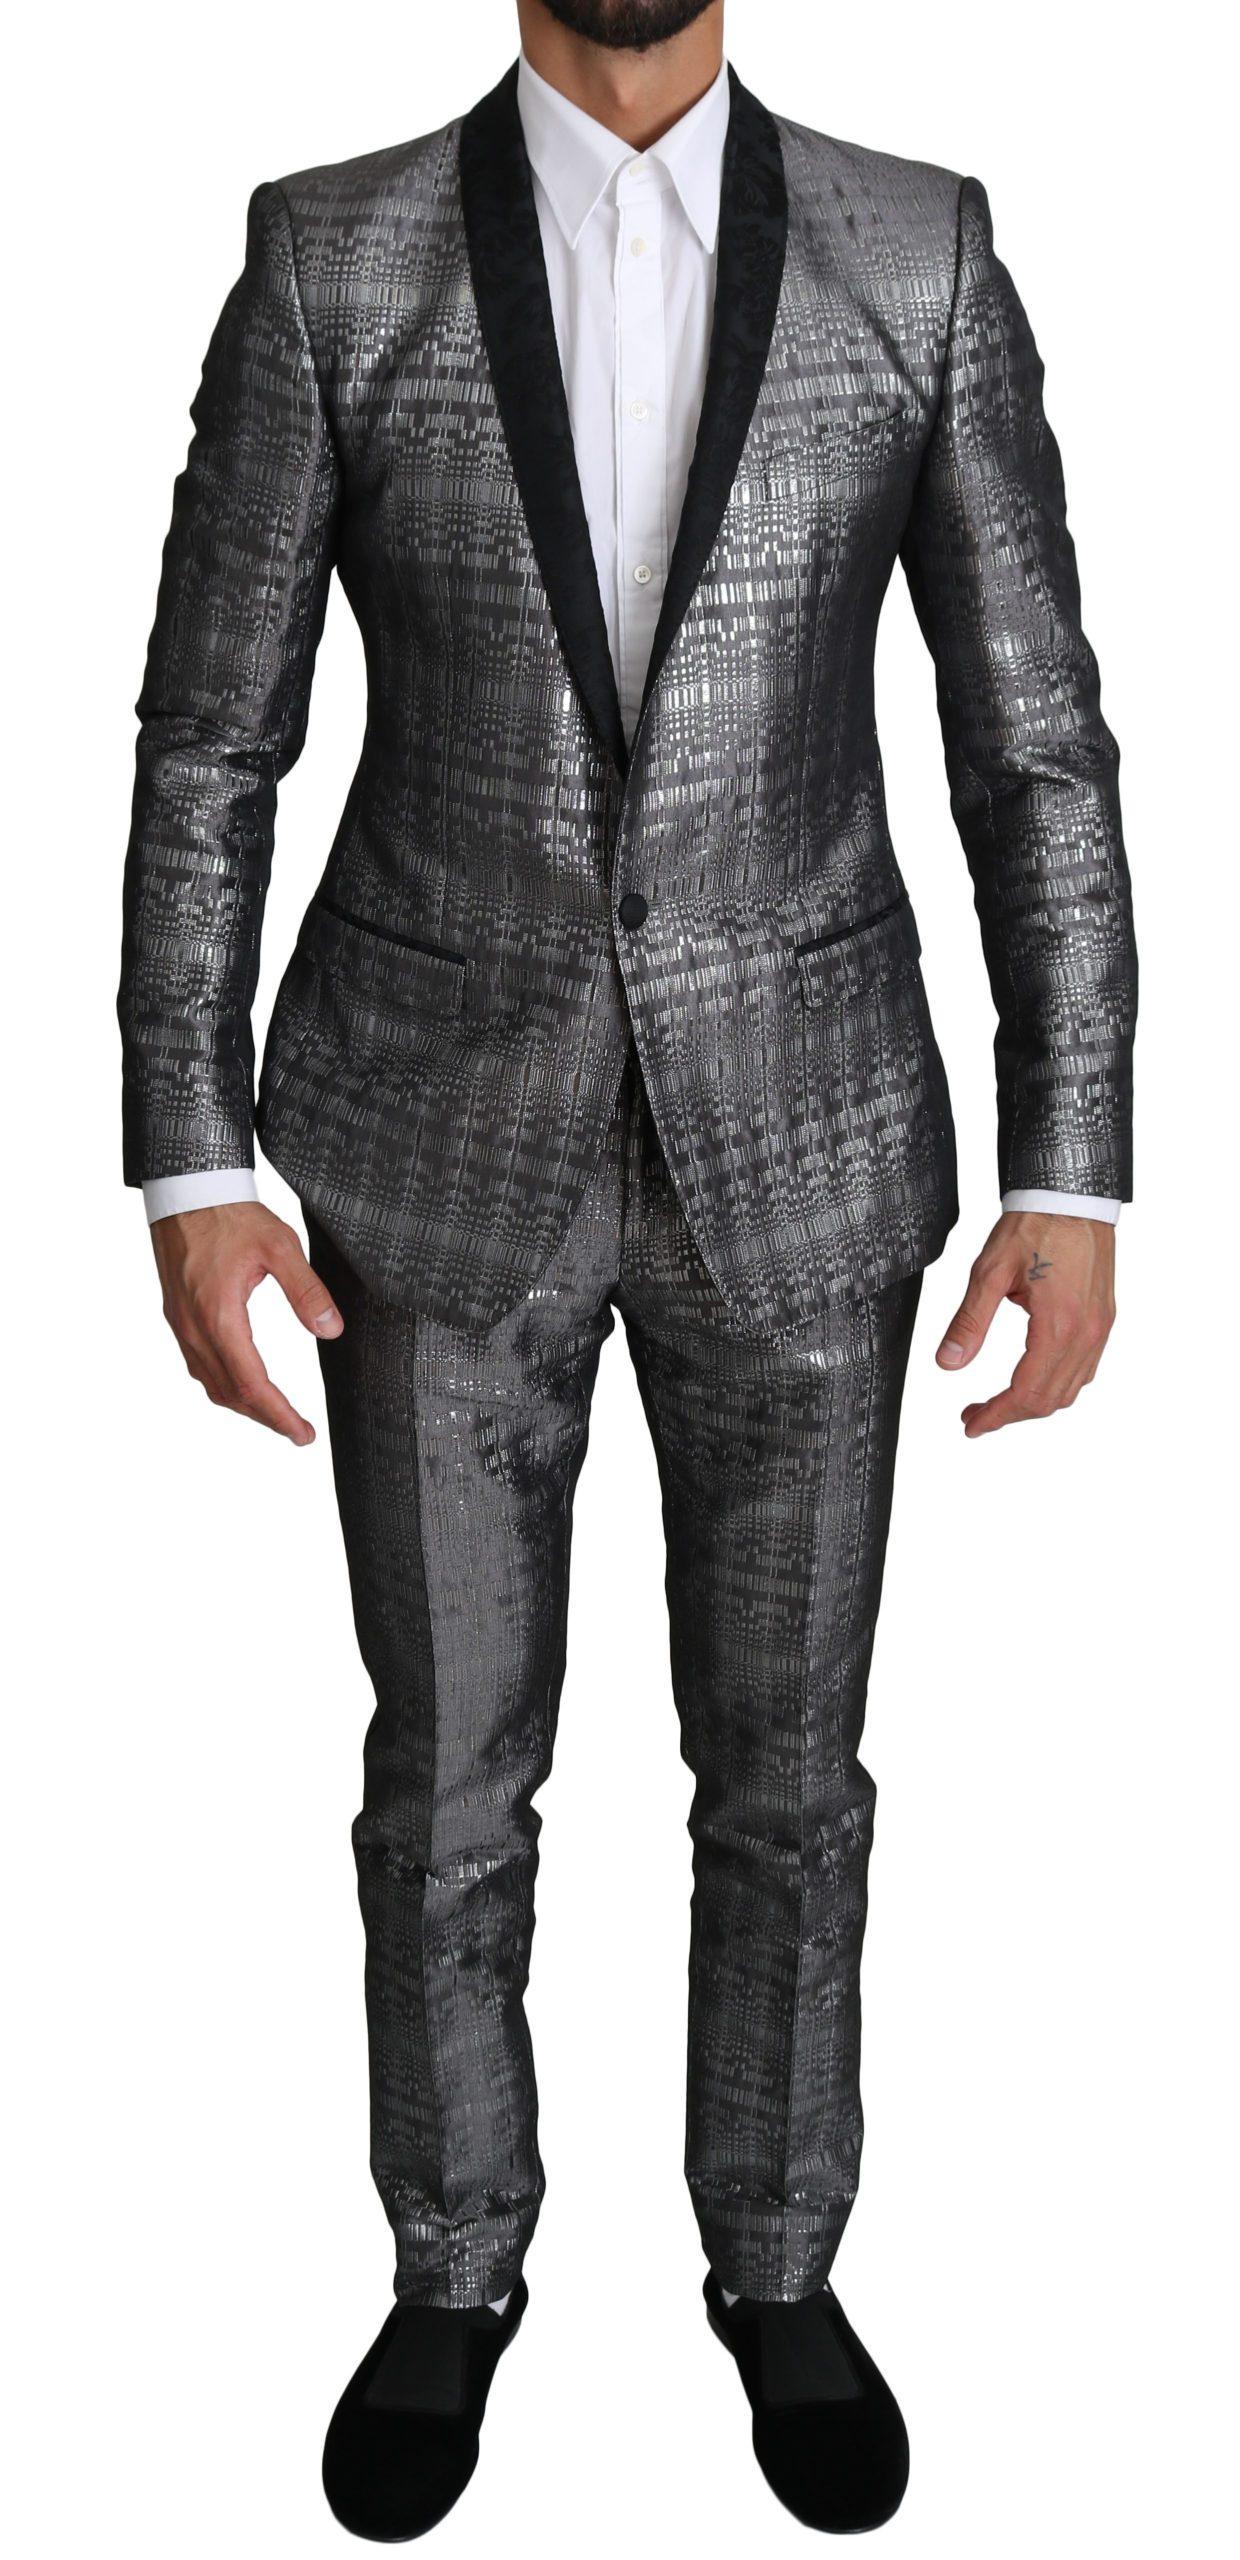 Dolce & Gabbana Men's Single Breasted 2 Piece Suit Silver KOS1547 - IT46 | S